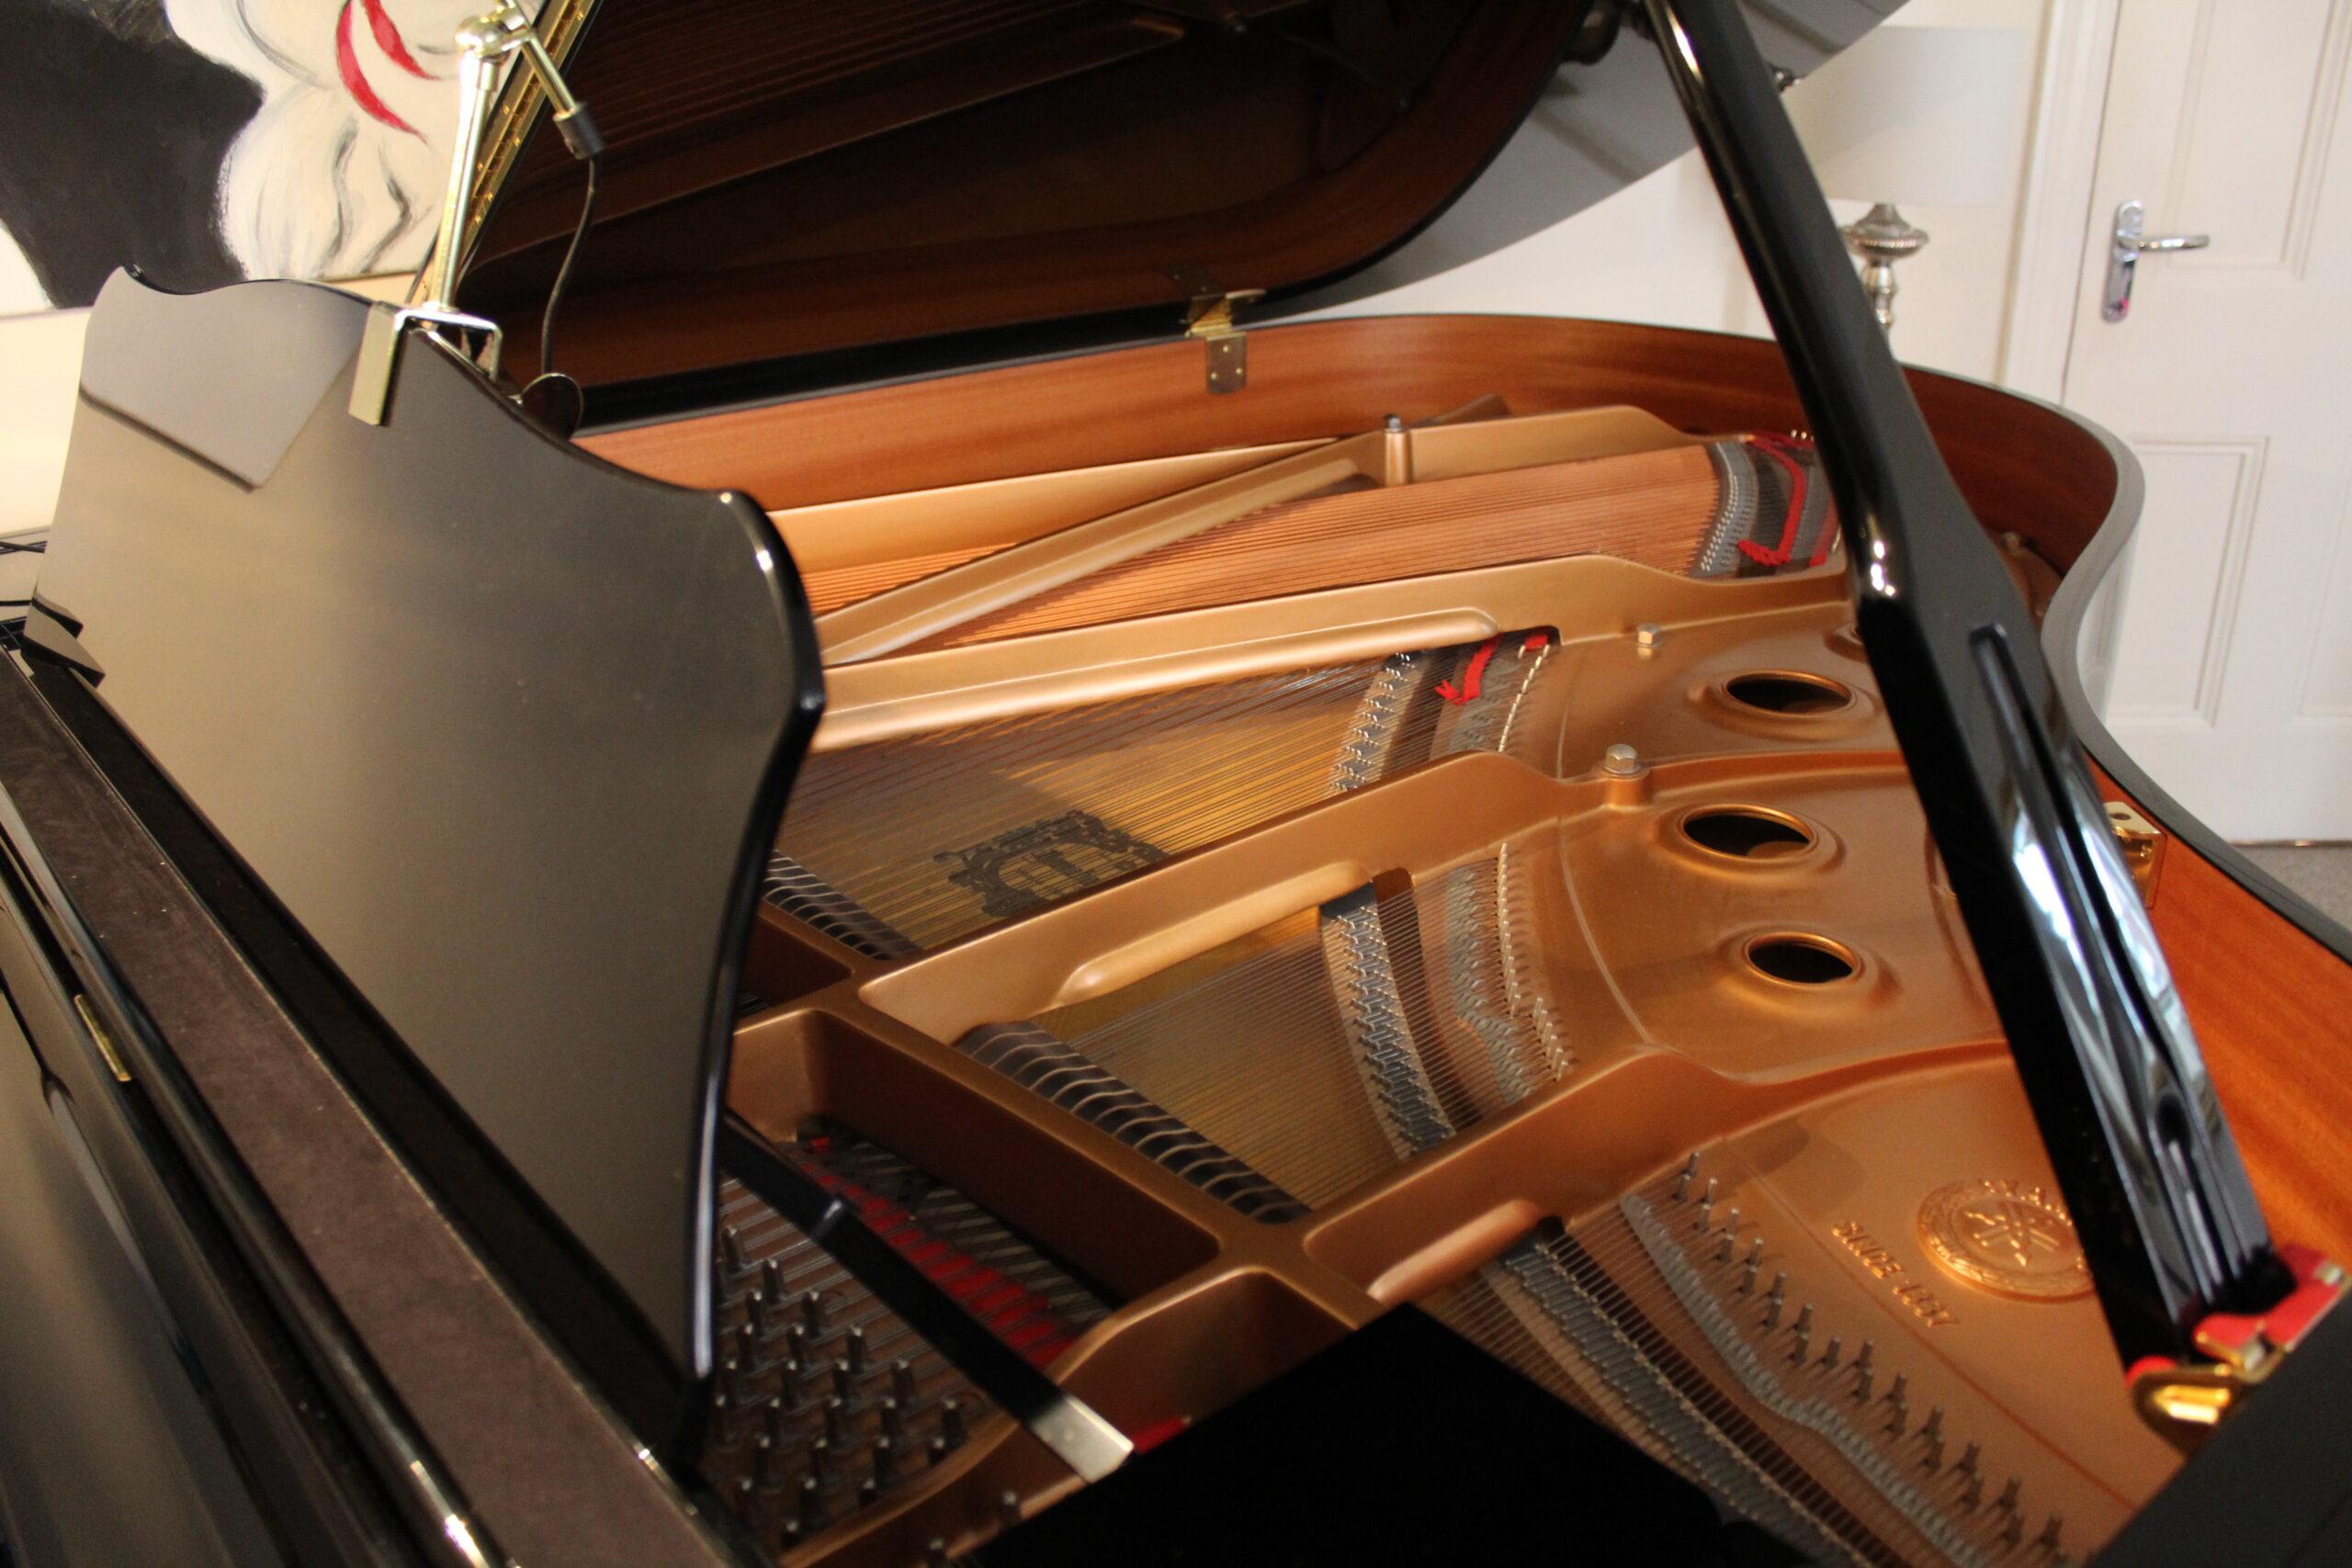 Setting up a piano recording studio